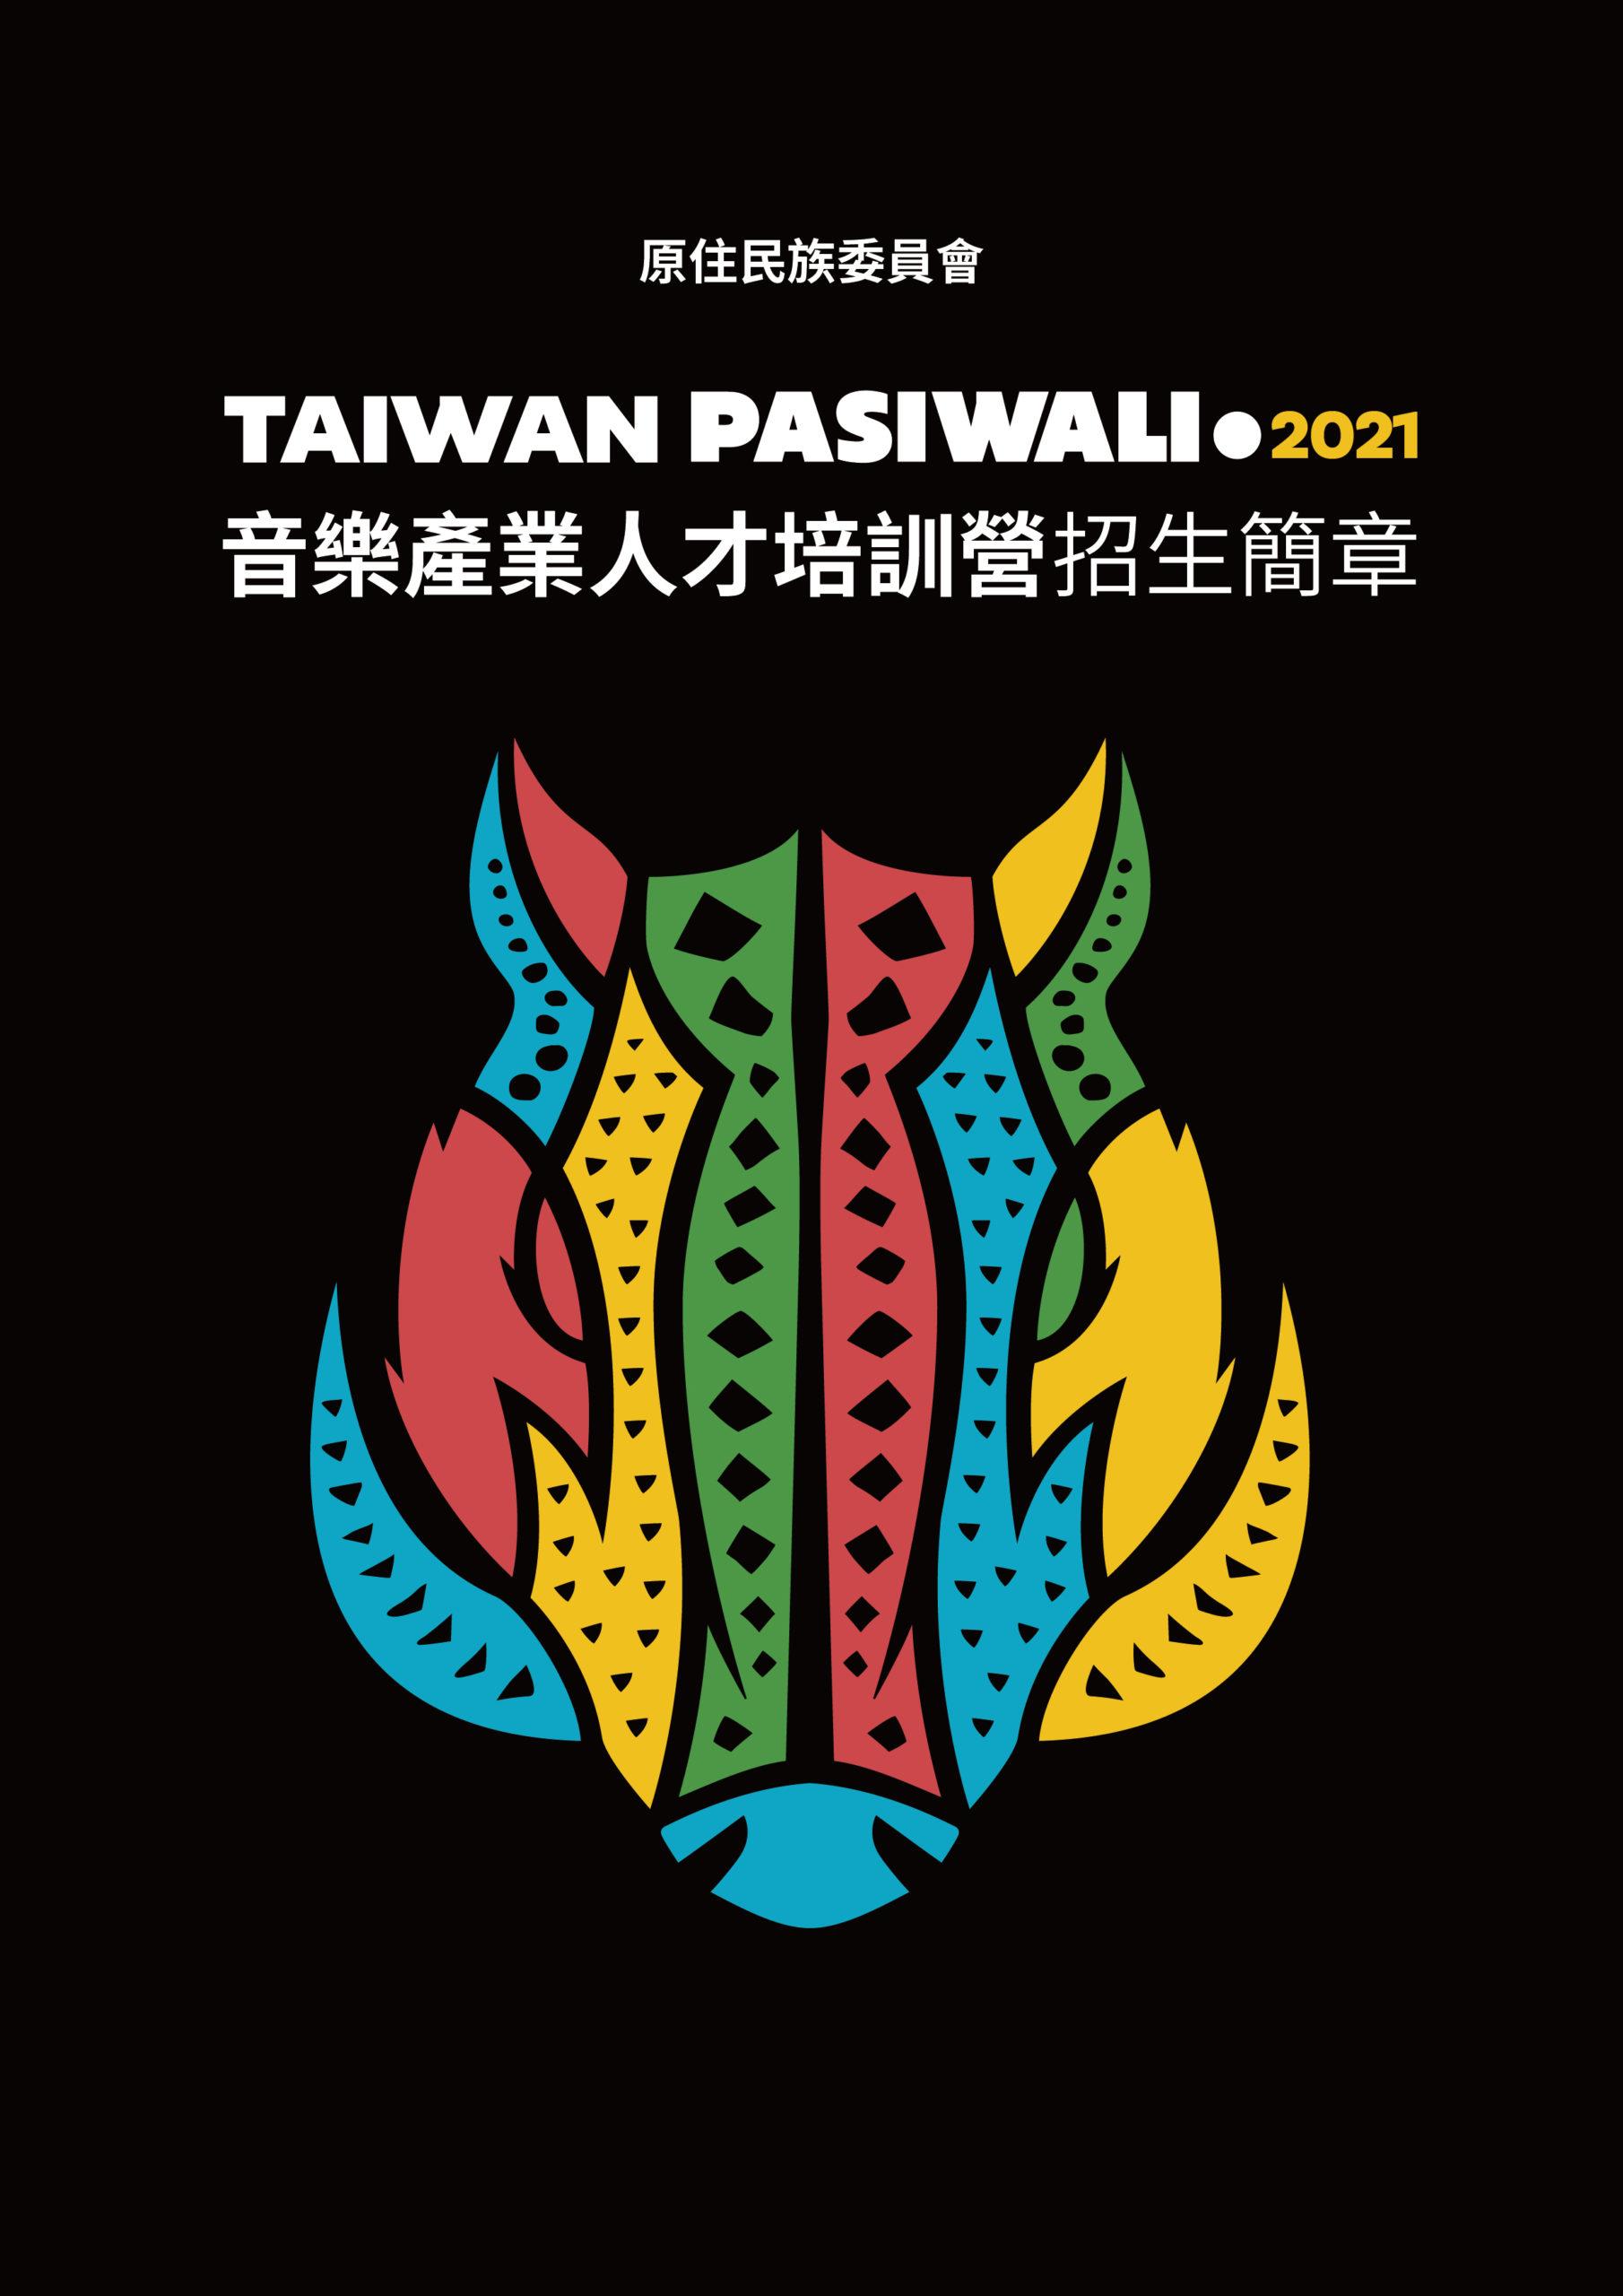 2021Taiwan PASIWALI培訓營招生簡章-01